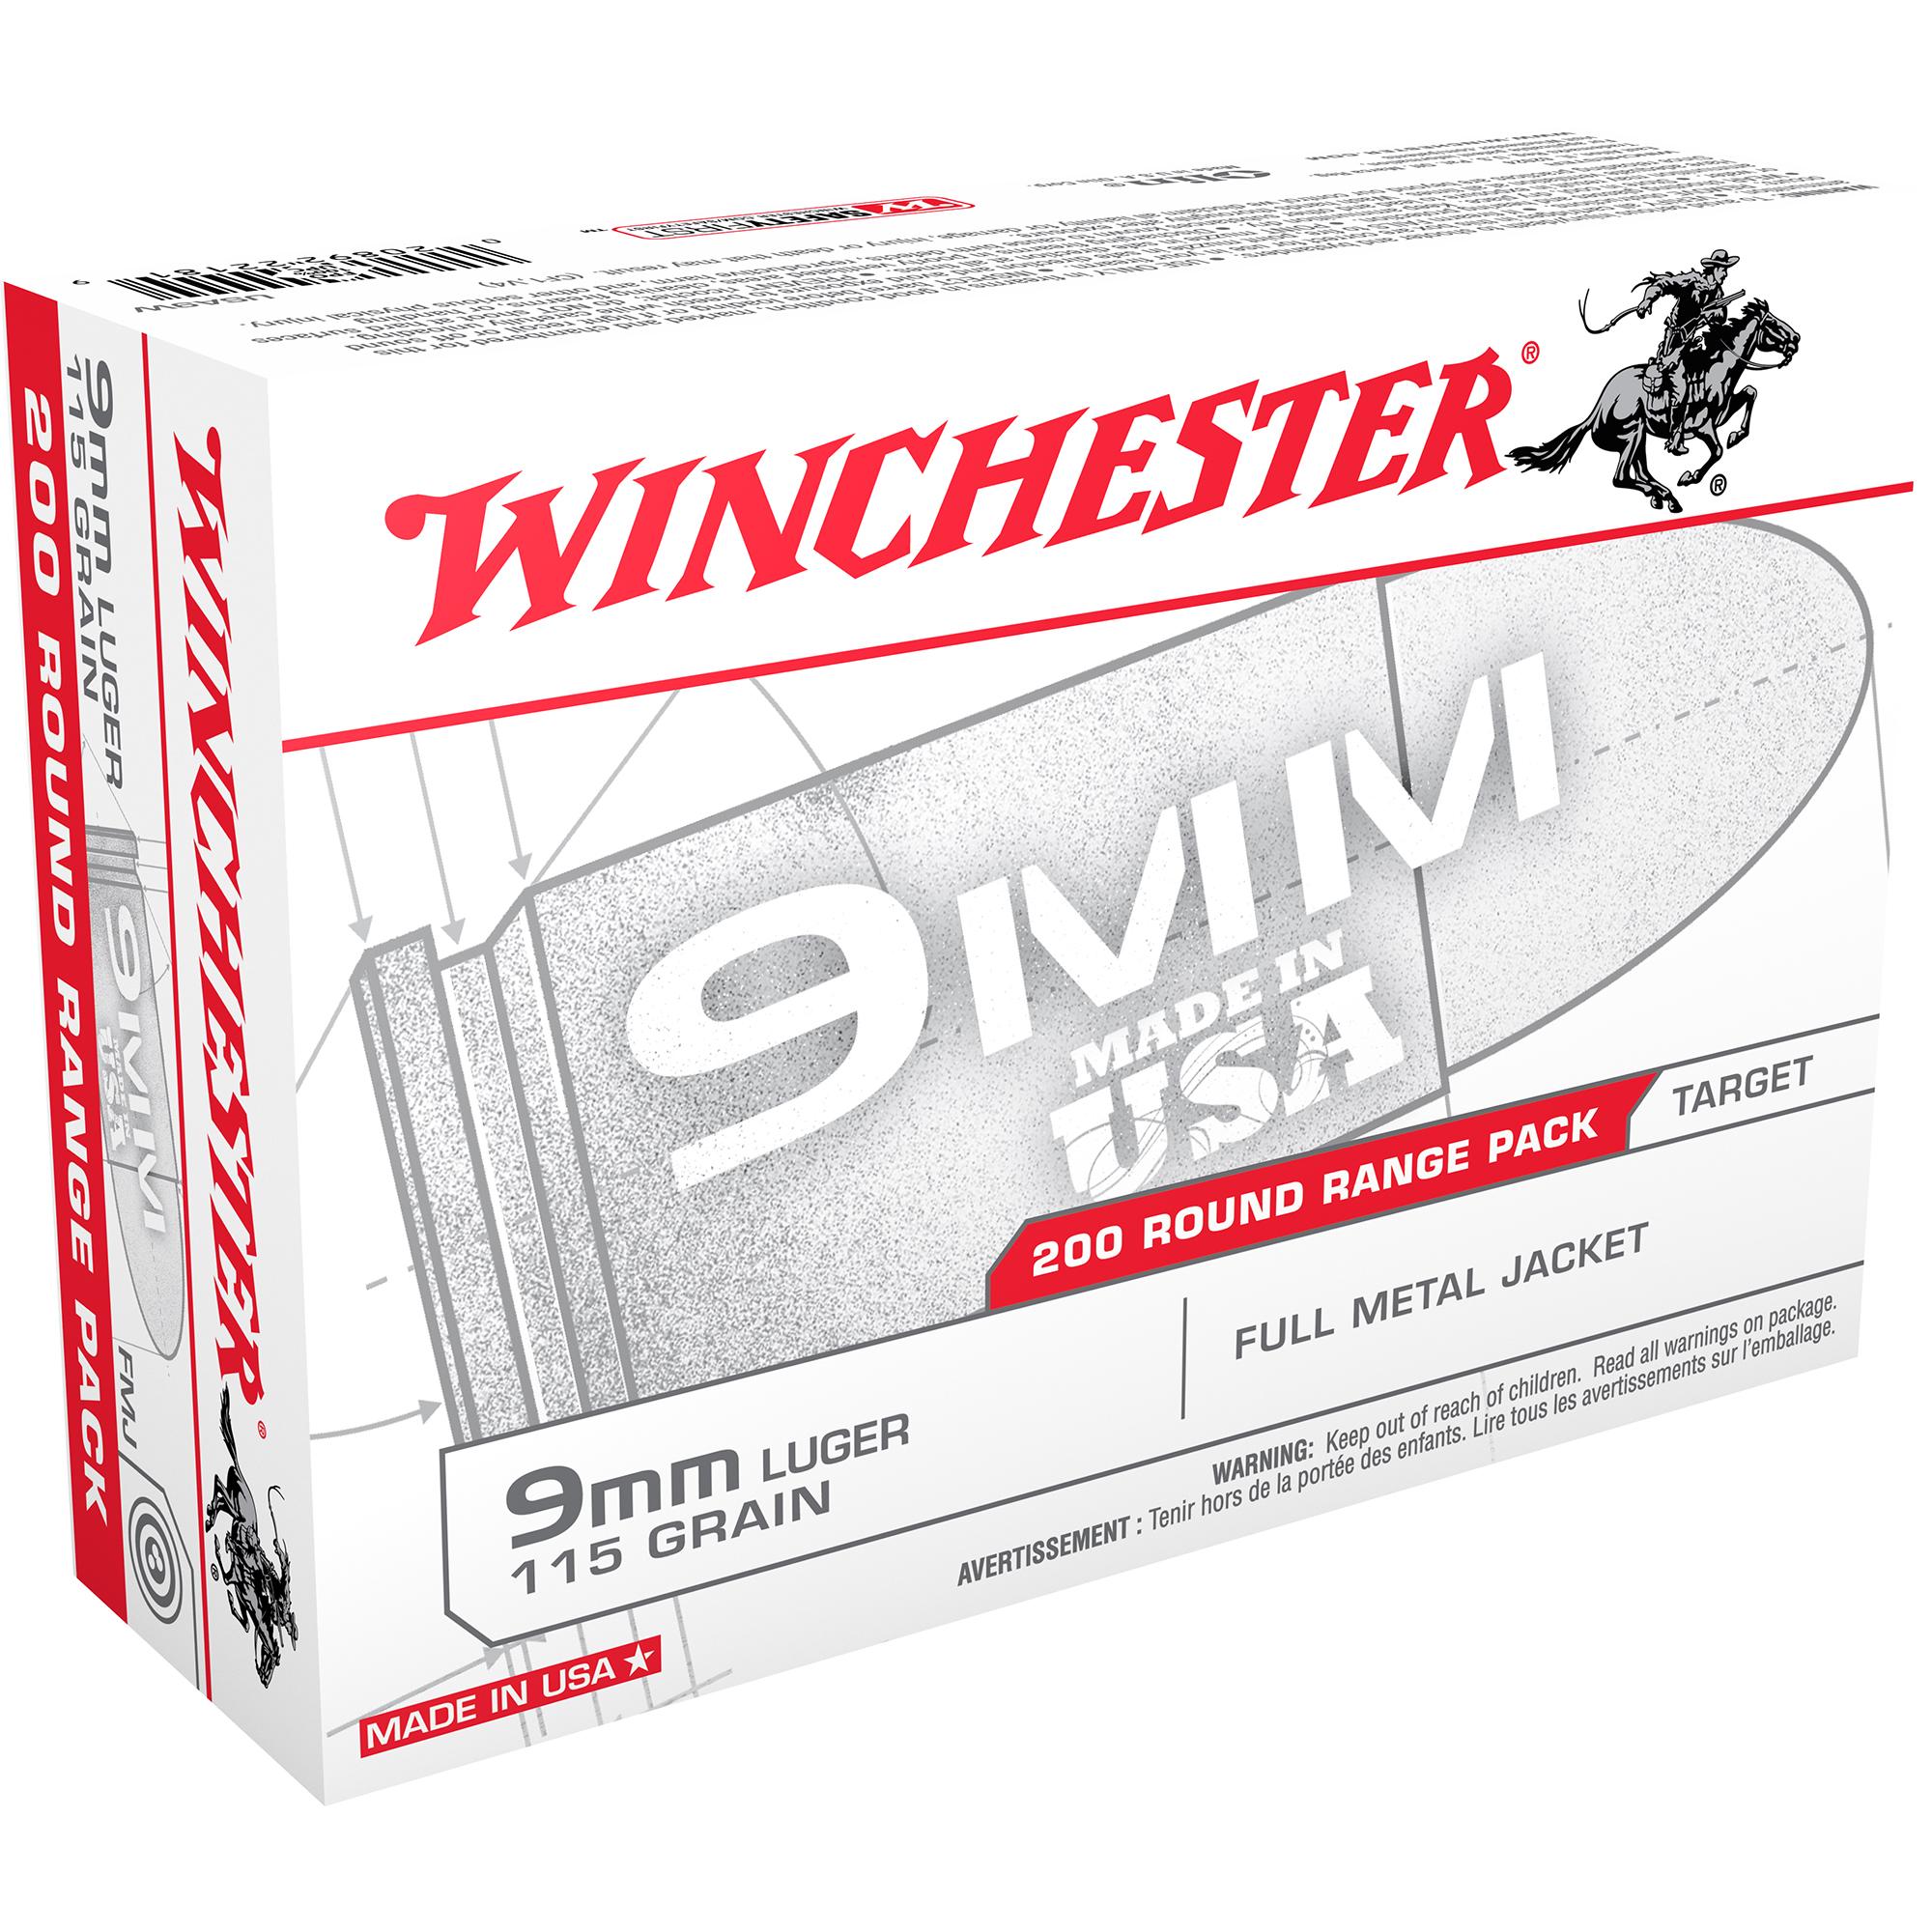 Winchester USA Handgun Ammo Range Pack, 9mm Luger, 115-gr, FMJ